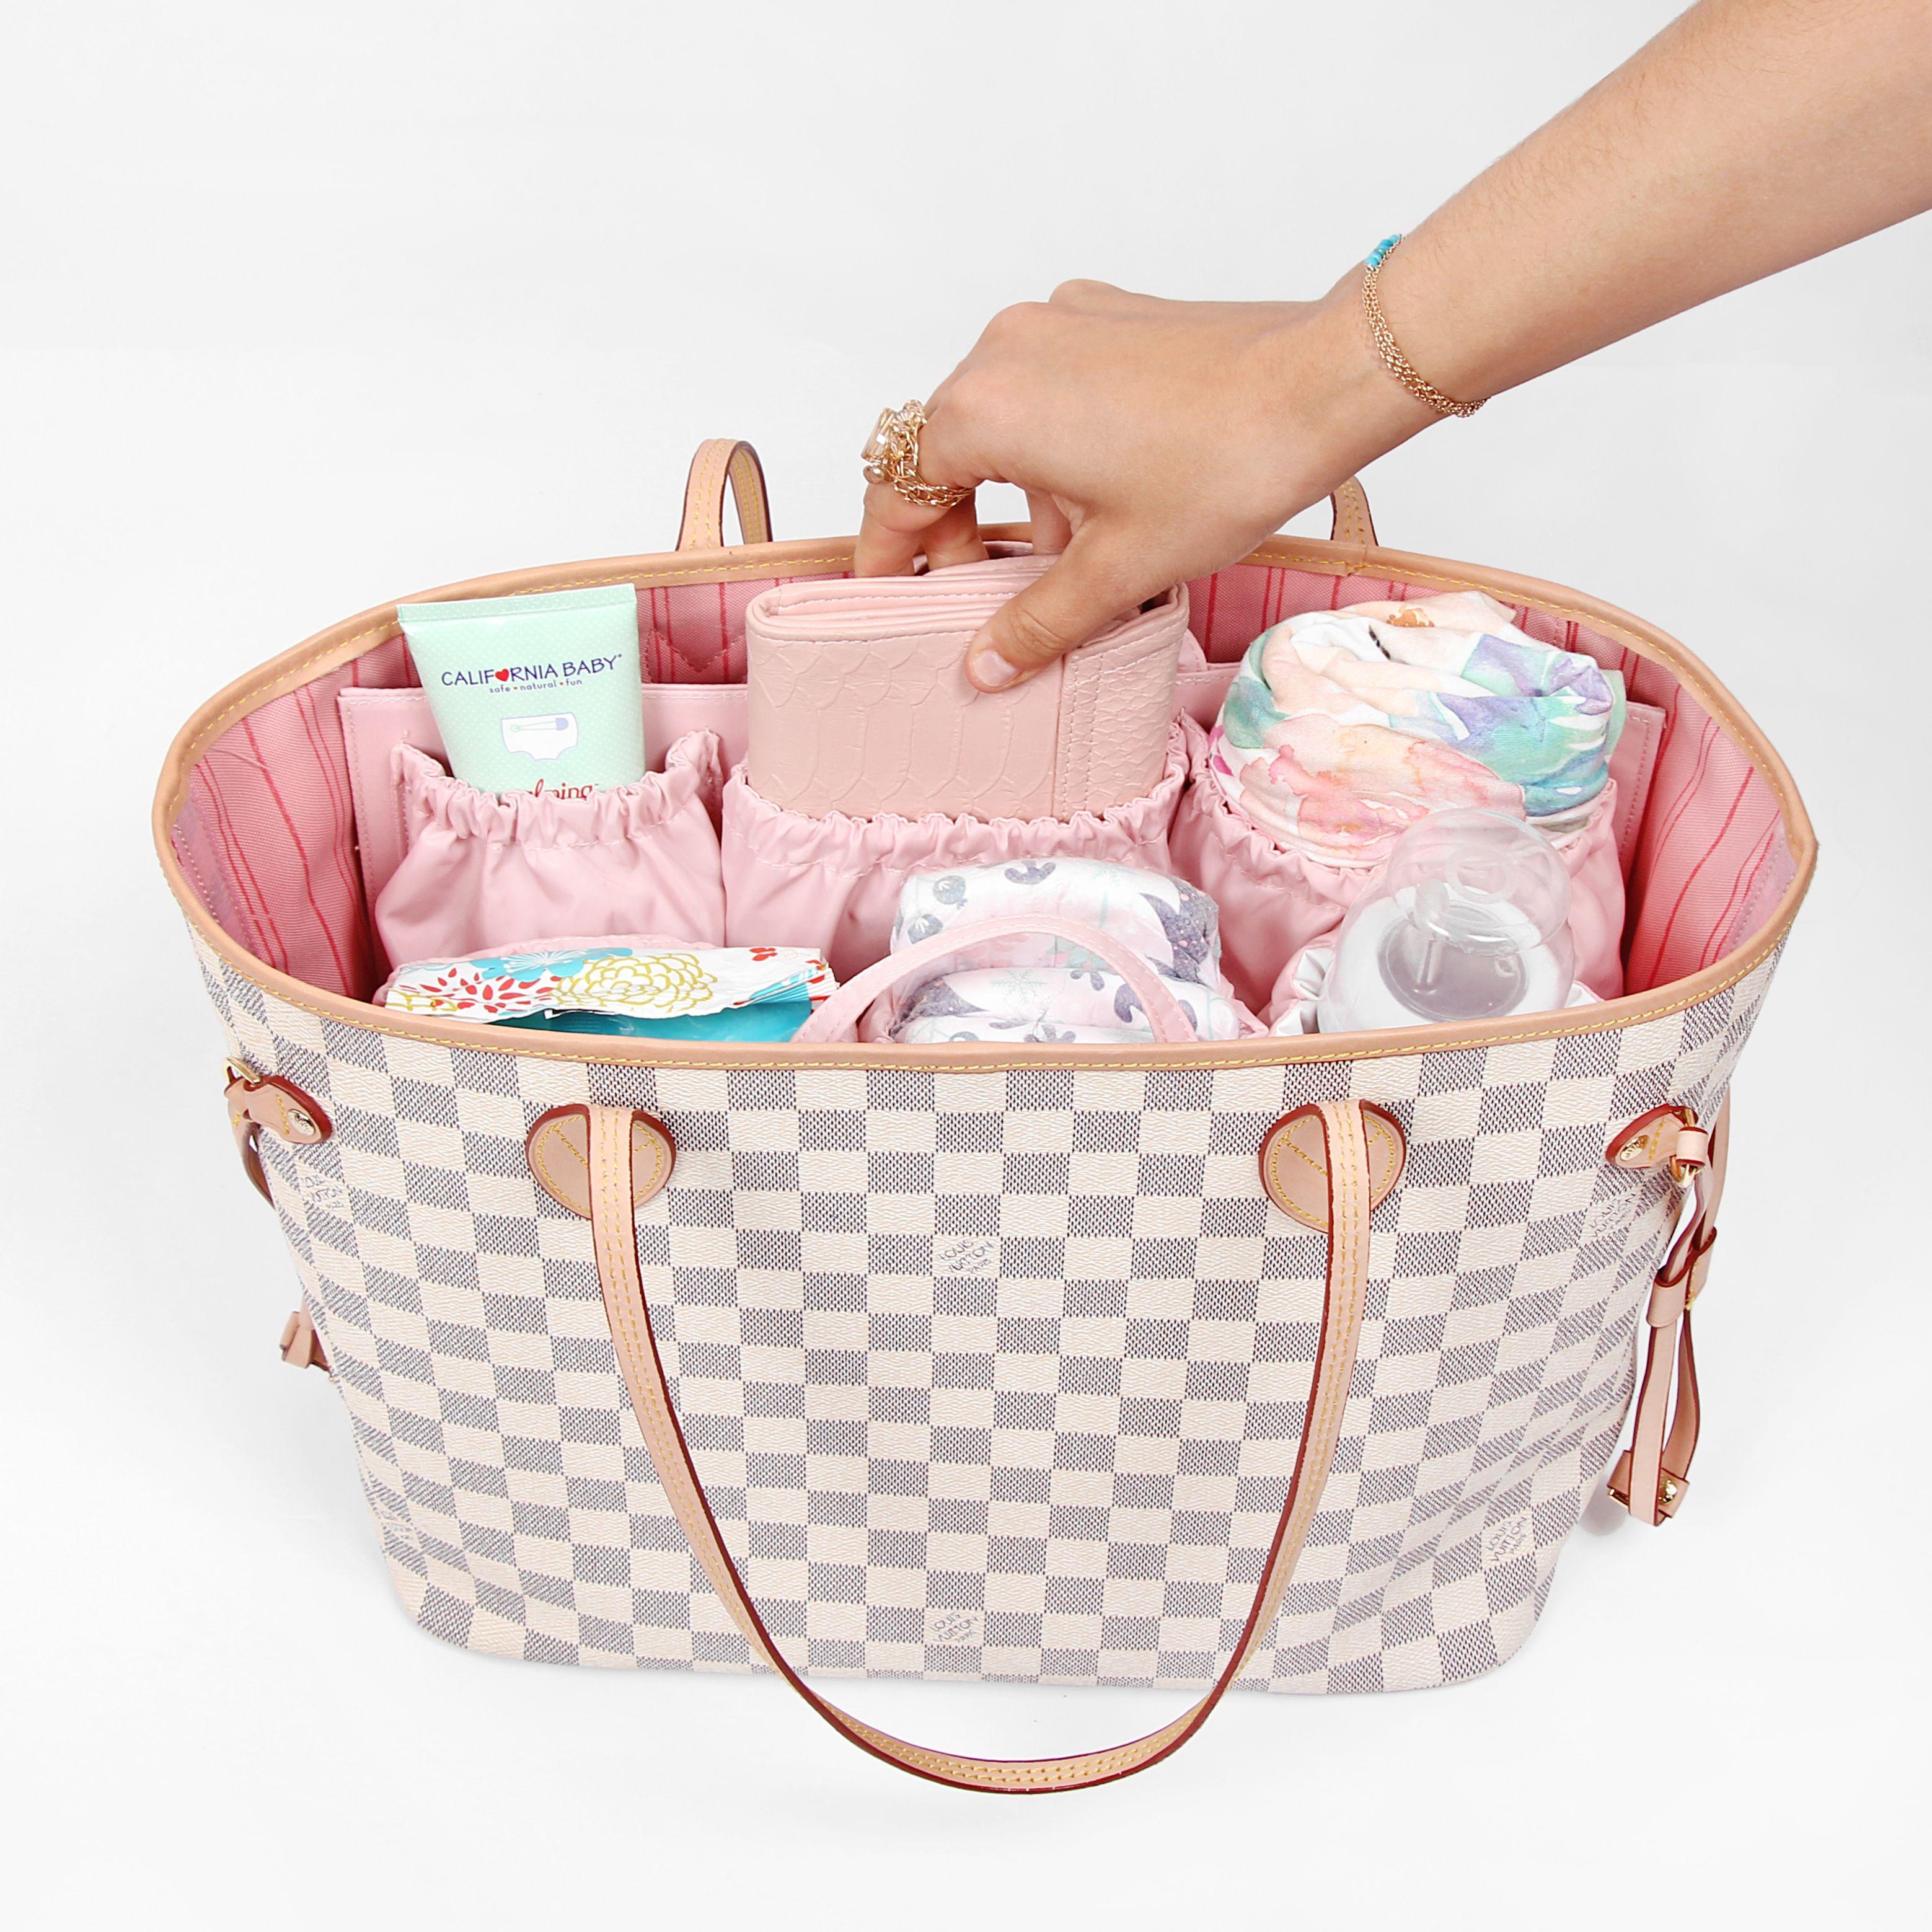 Neverfull Mm Totesavvy Original Baby Girl Diaper Bags Girl Diaper Bag Baby Diaper Bags